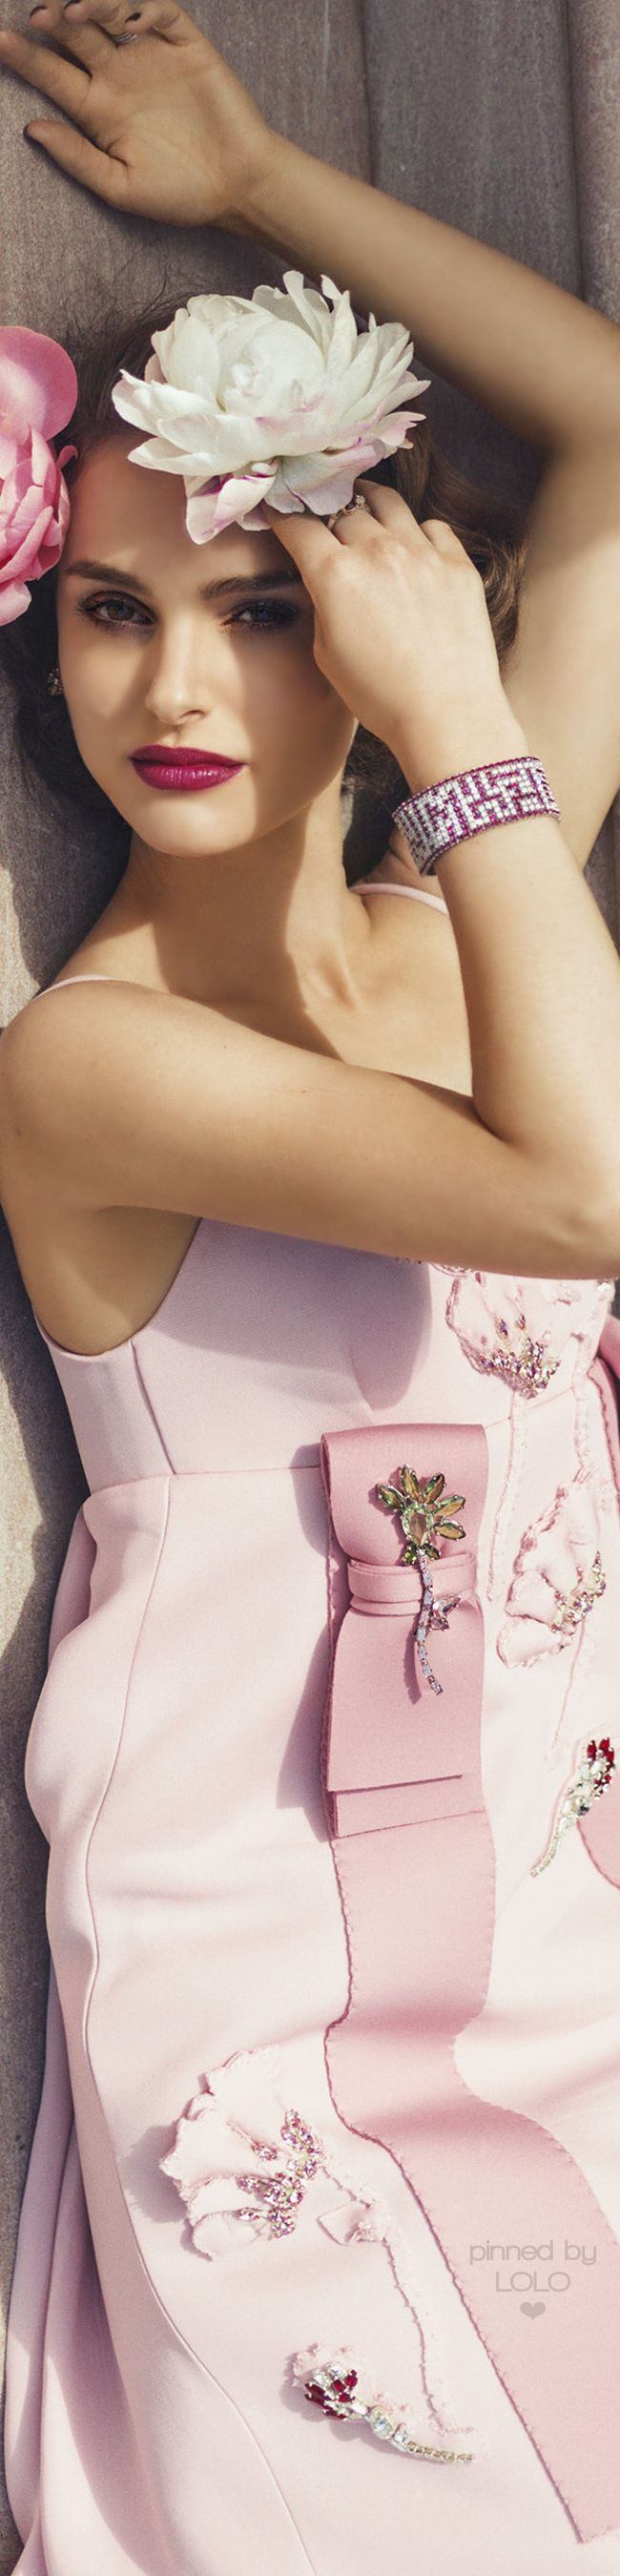 "Natalie Portman for Harper's Bazaar by Norman Jean Roy | LOLO❤ ~ ""Fleurissima Originale"""